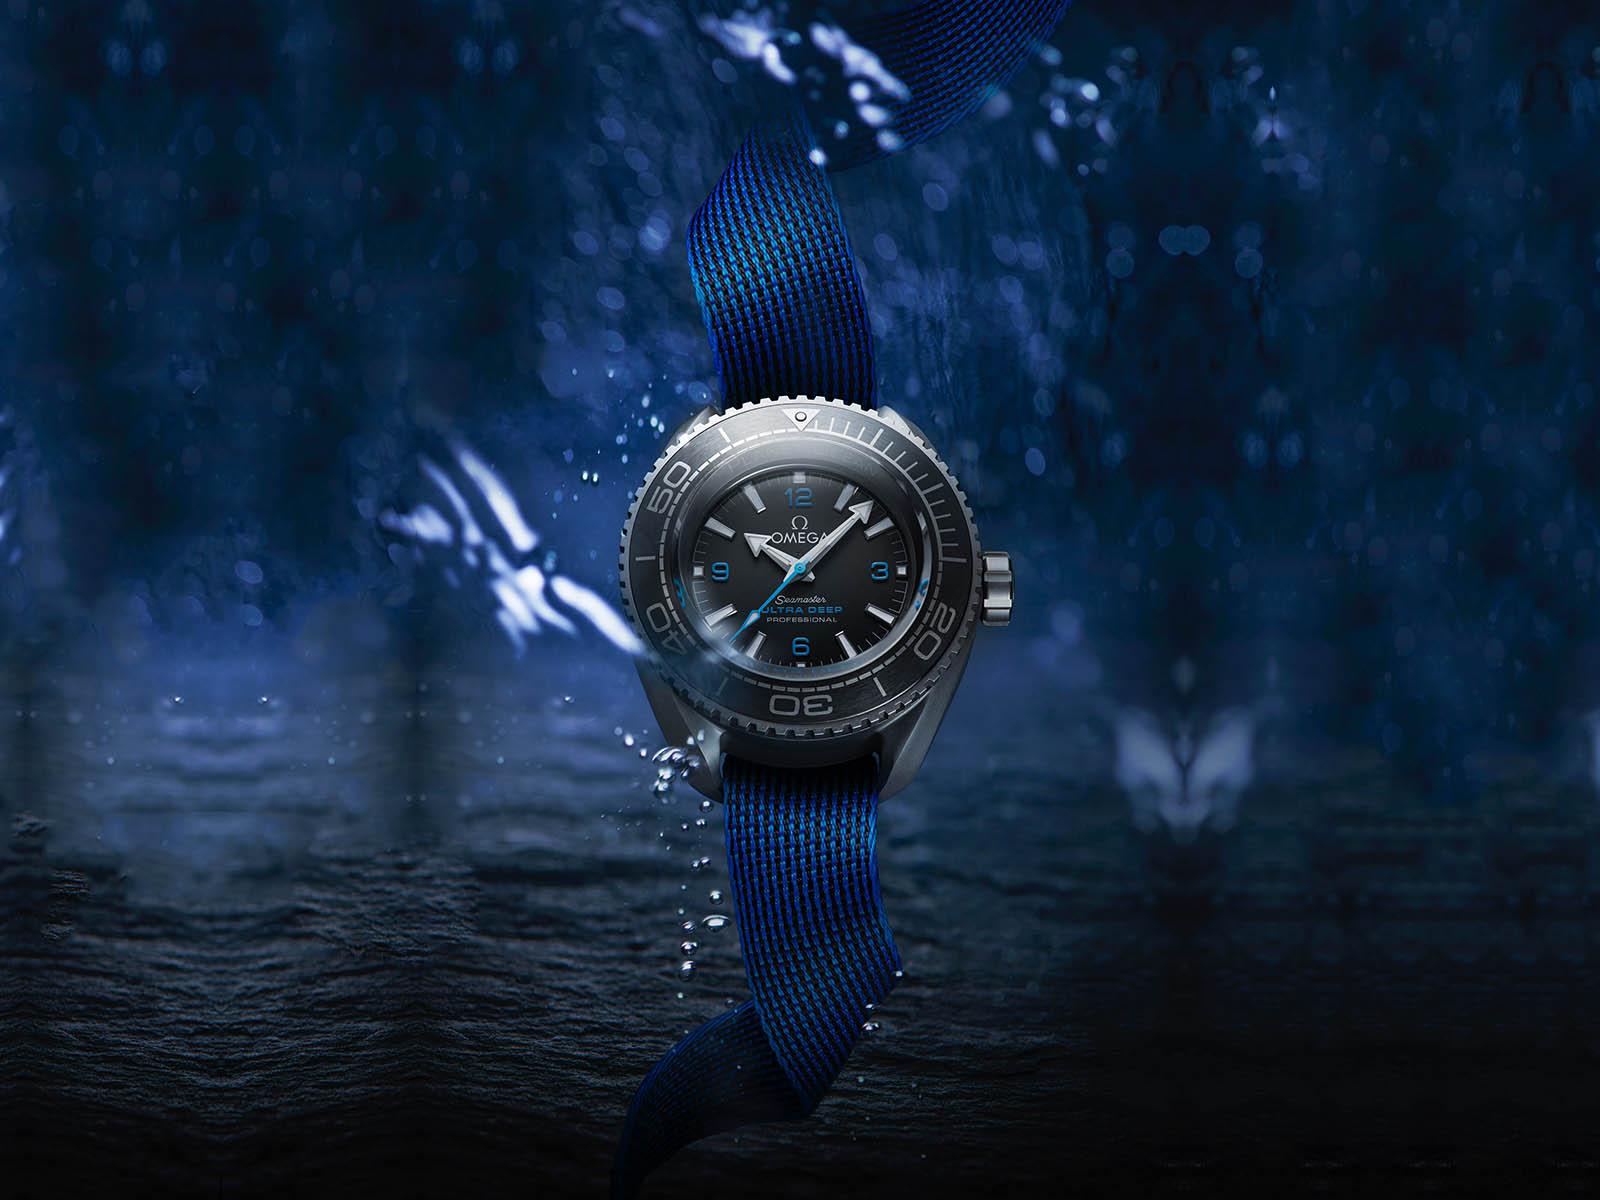 omega-seamaster-planet-ocean-ultra-deep-professional-1.jpg